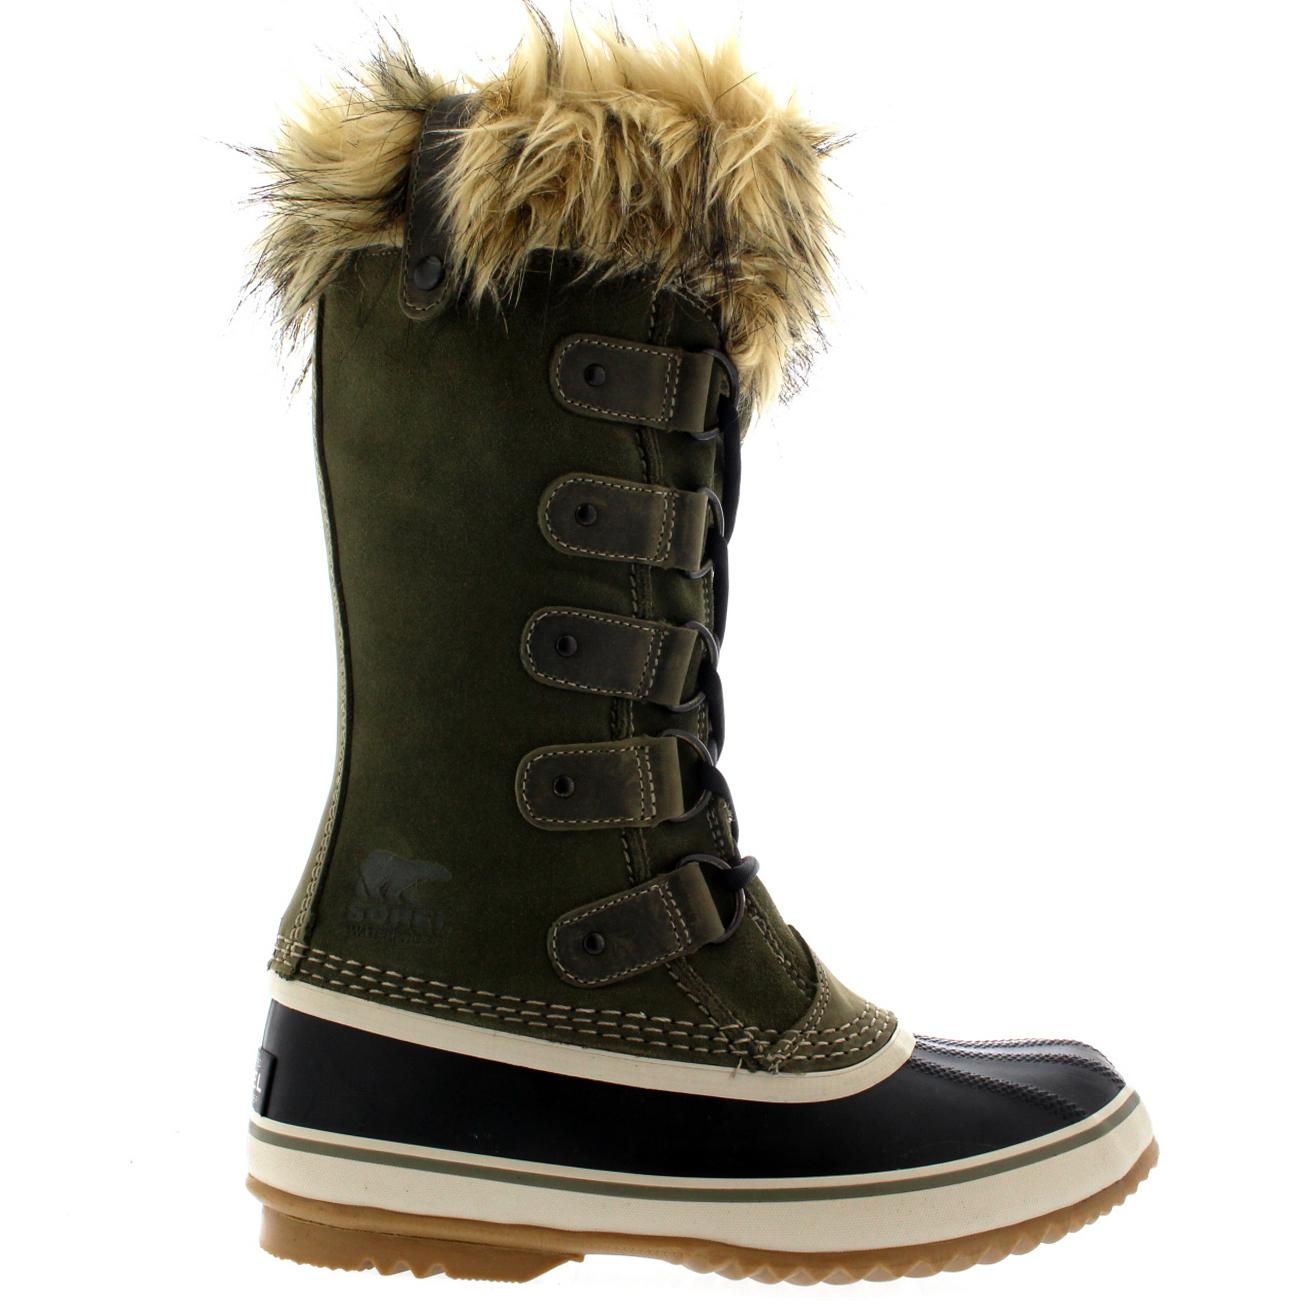 Womens Snow Boots Size 9 Uk   Homewood Mountain Ski Resort